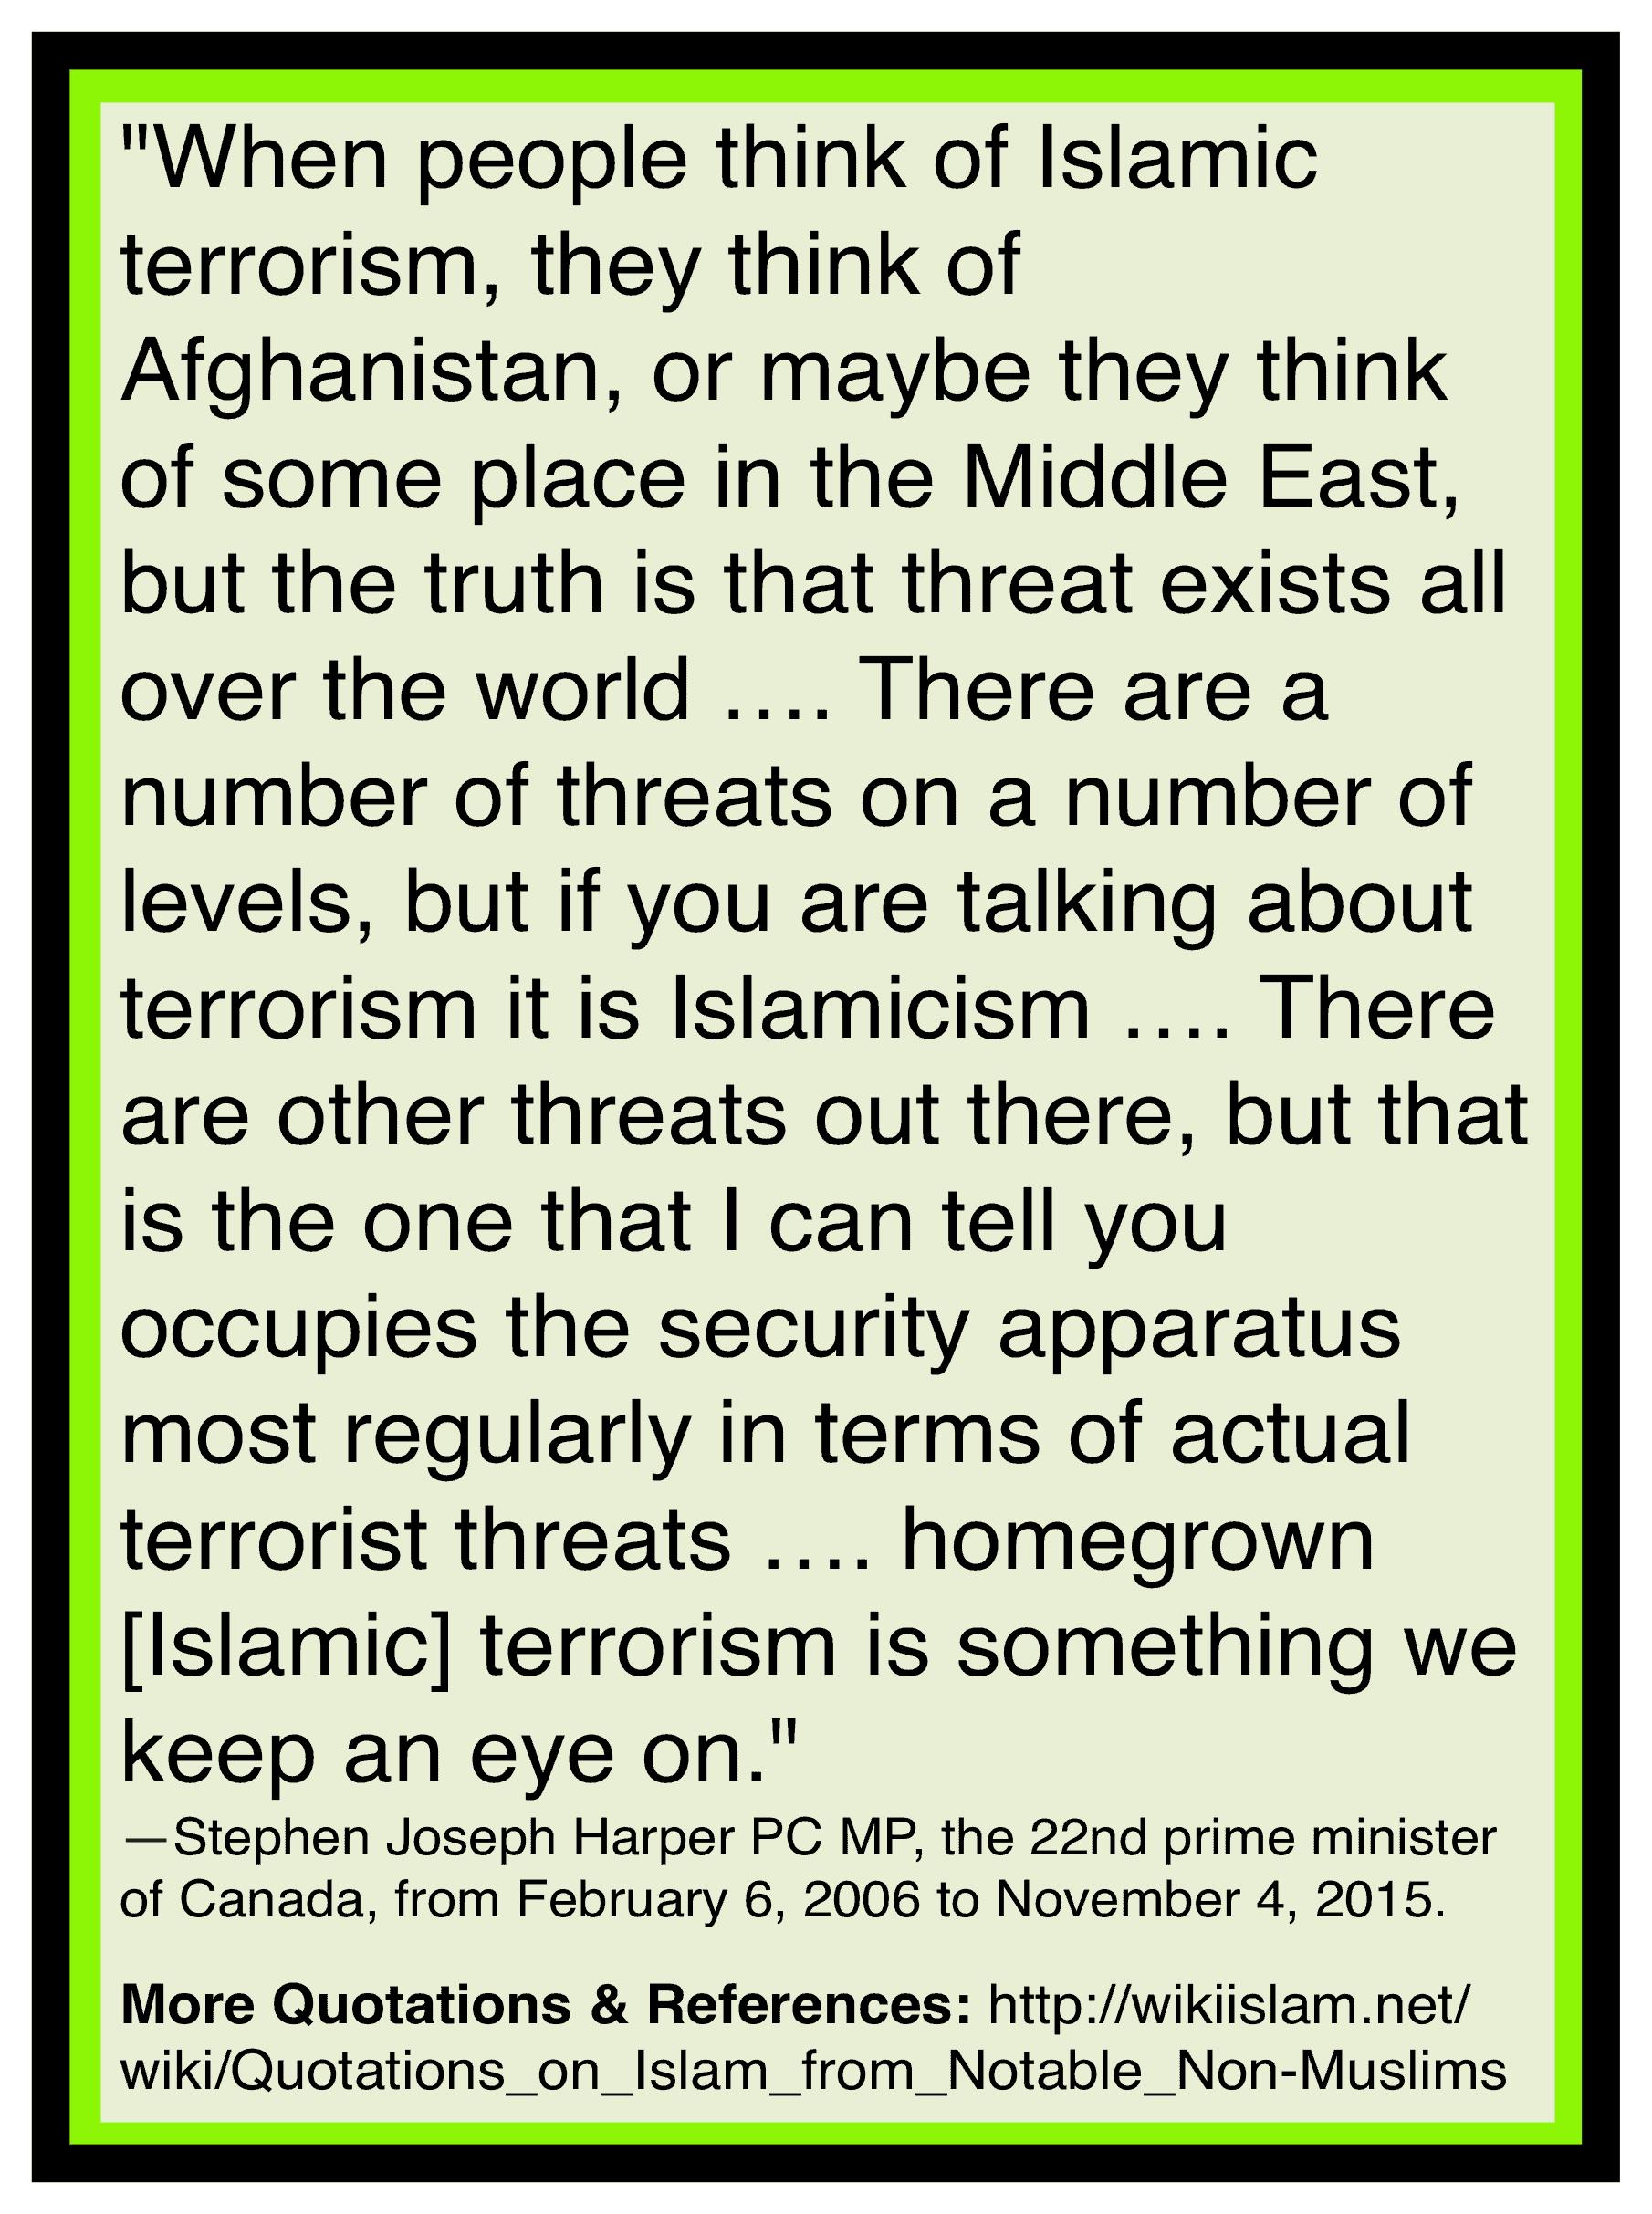 Islam is terrorism